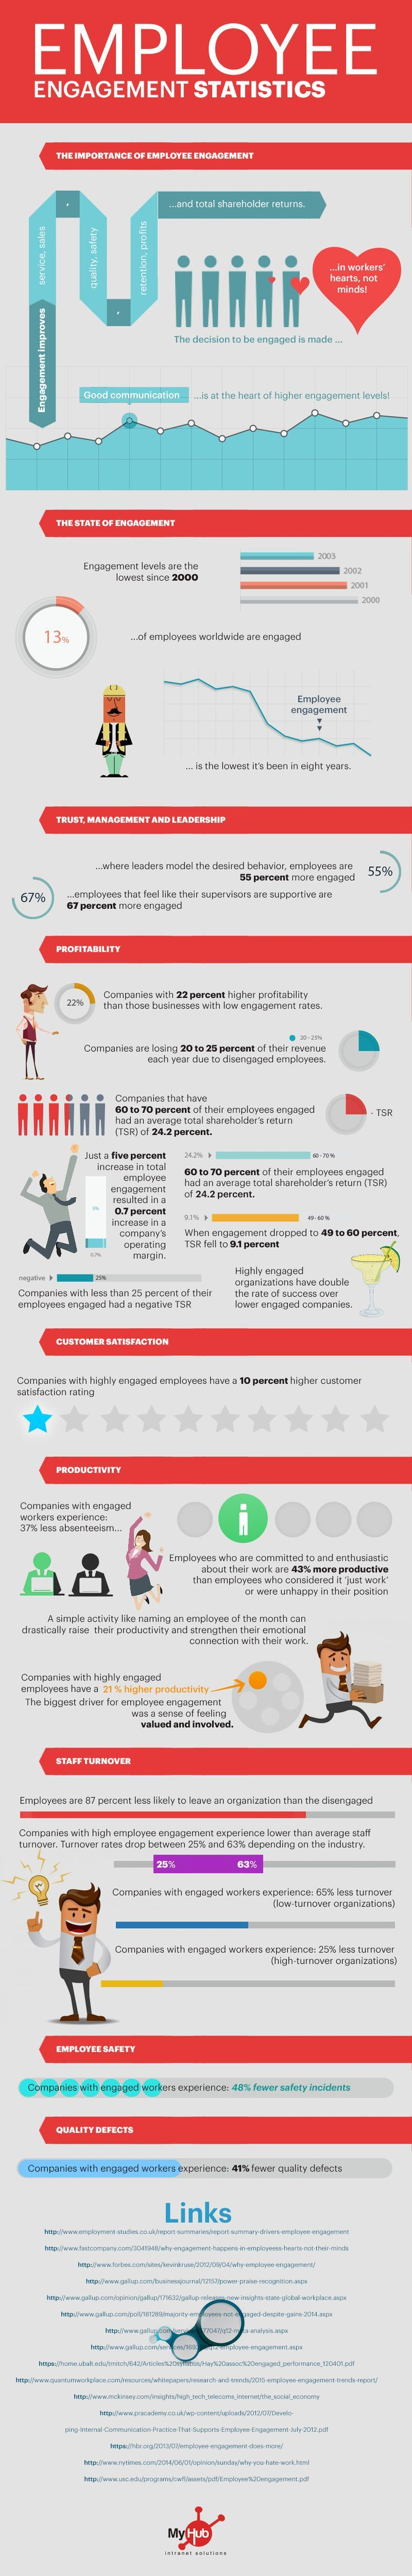 Employee Engagement #Infographic #Engagement #Management